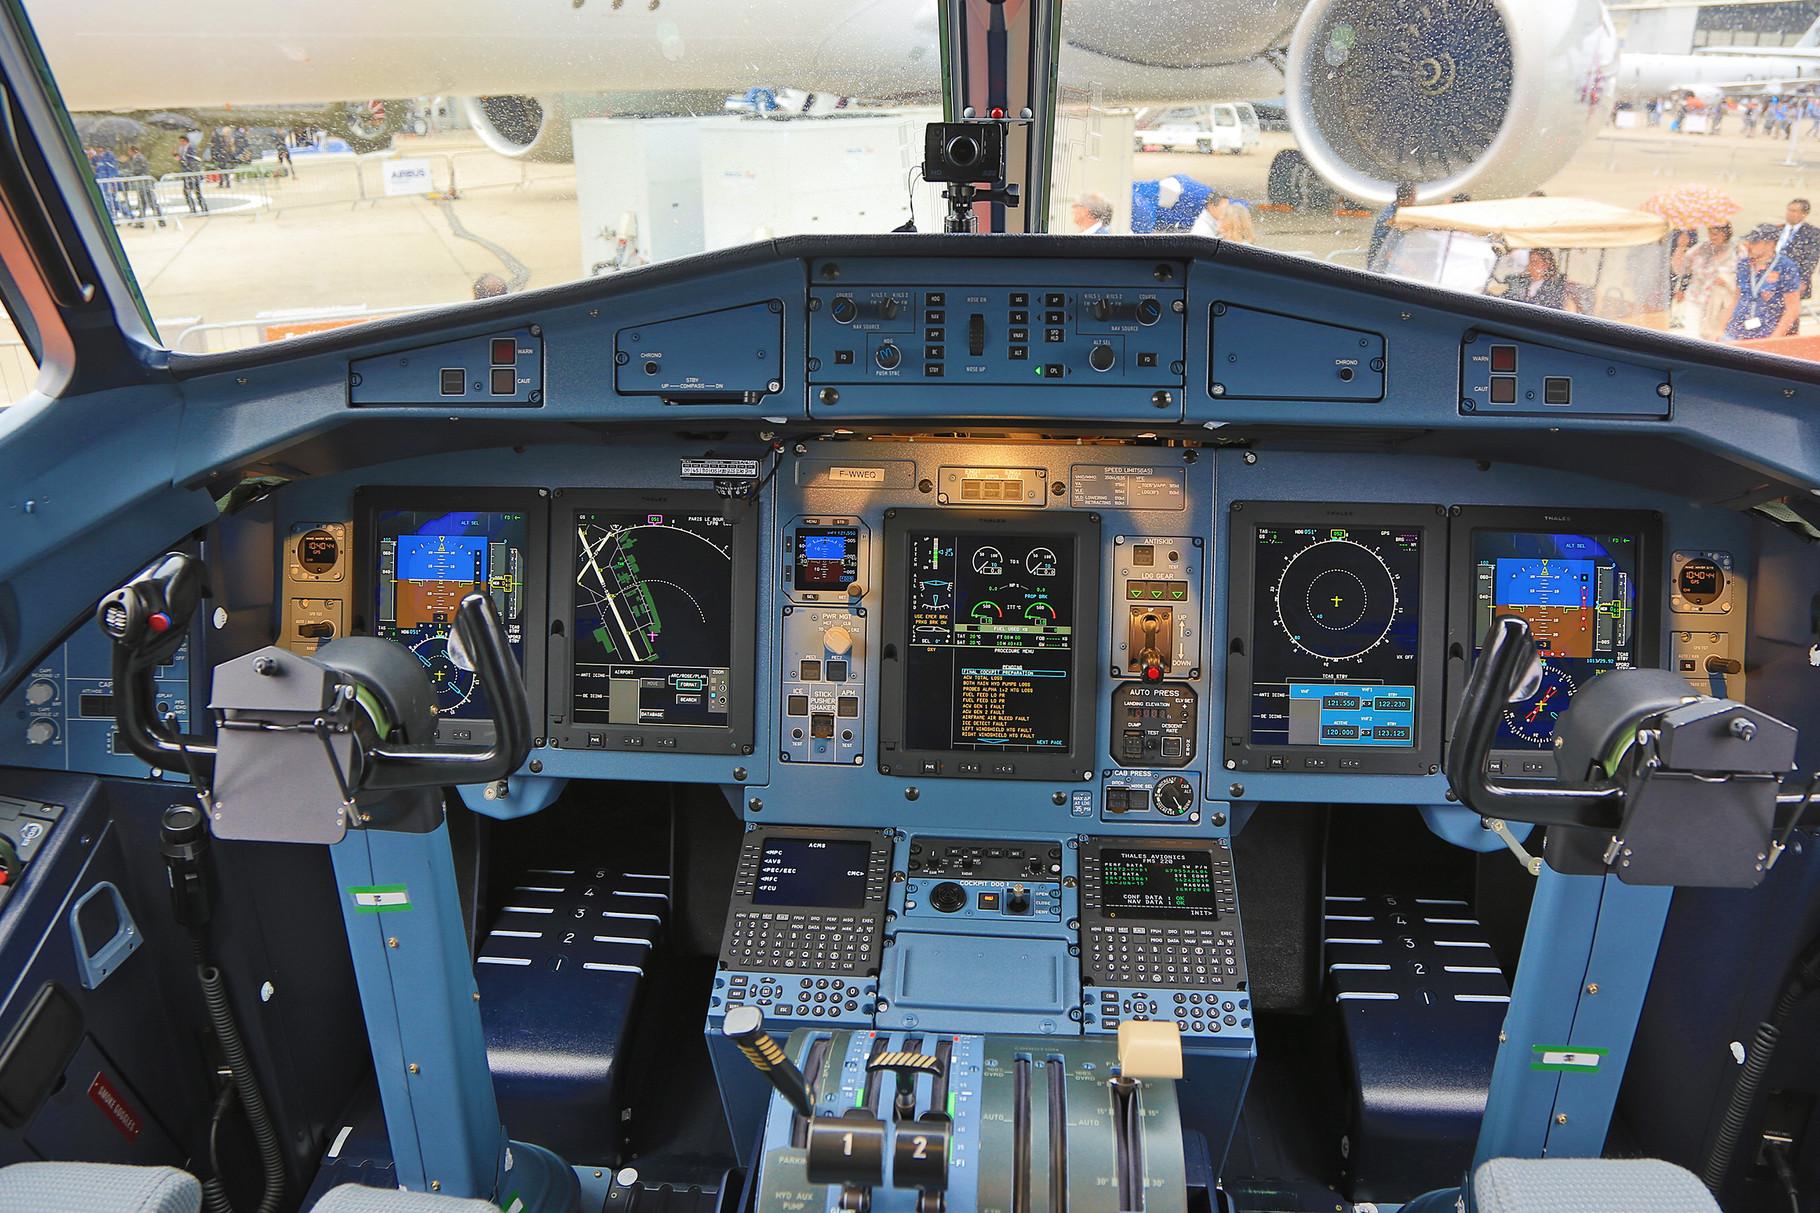 Das Cockpit der ATR.